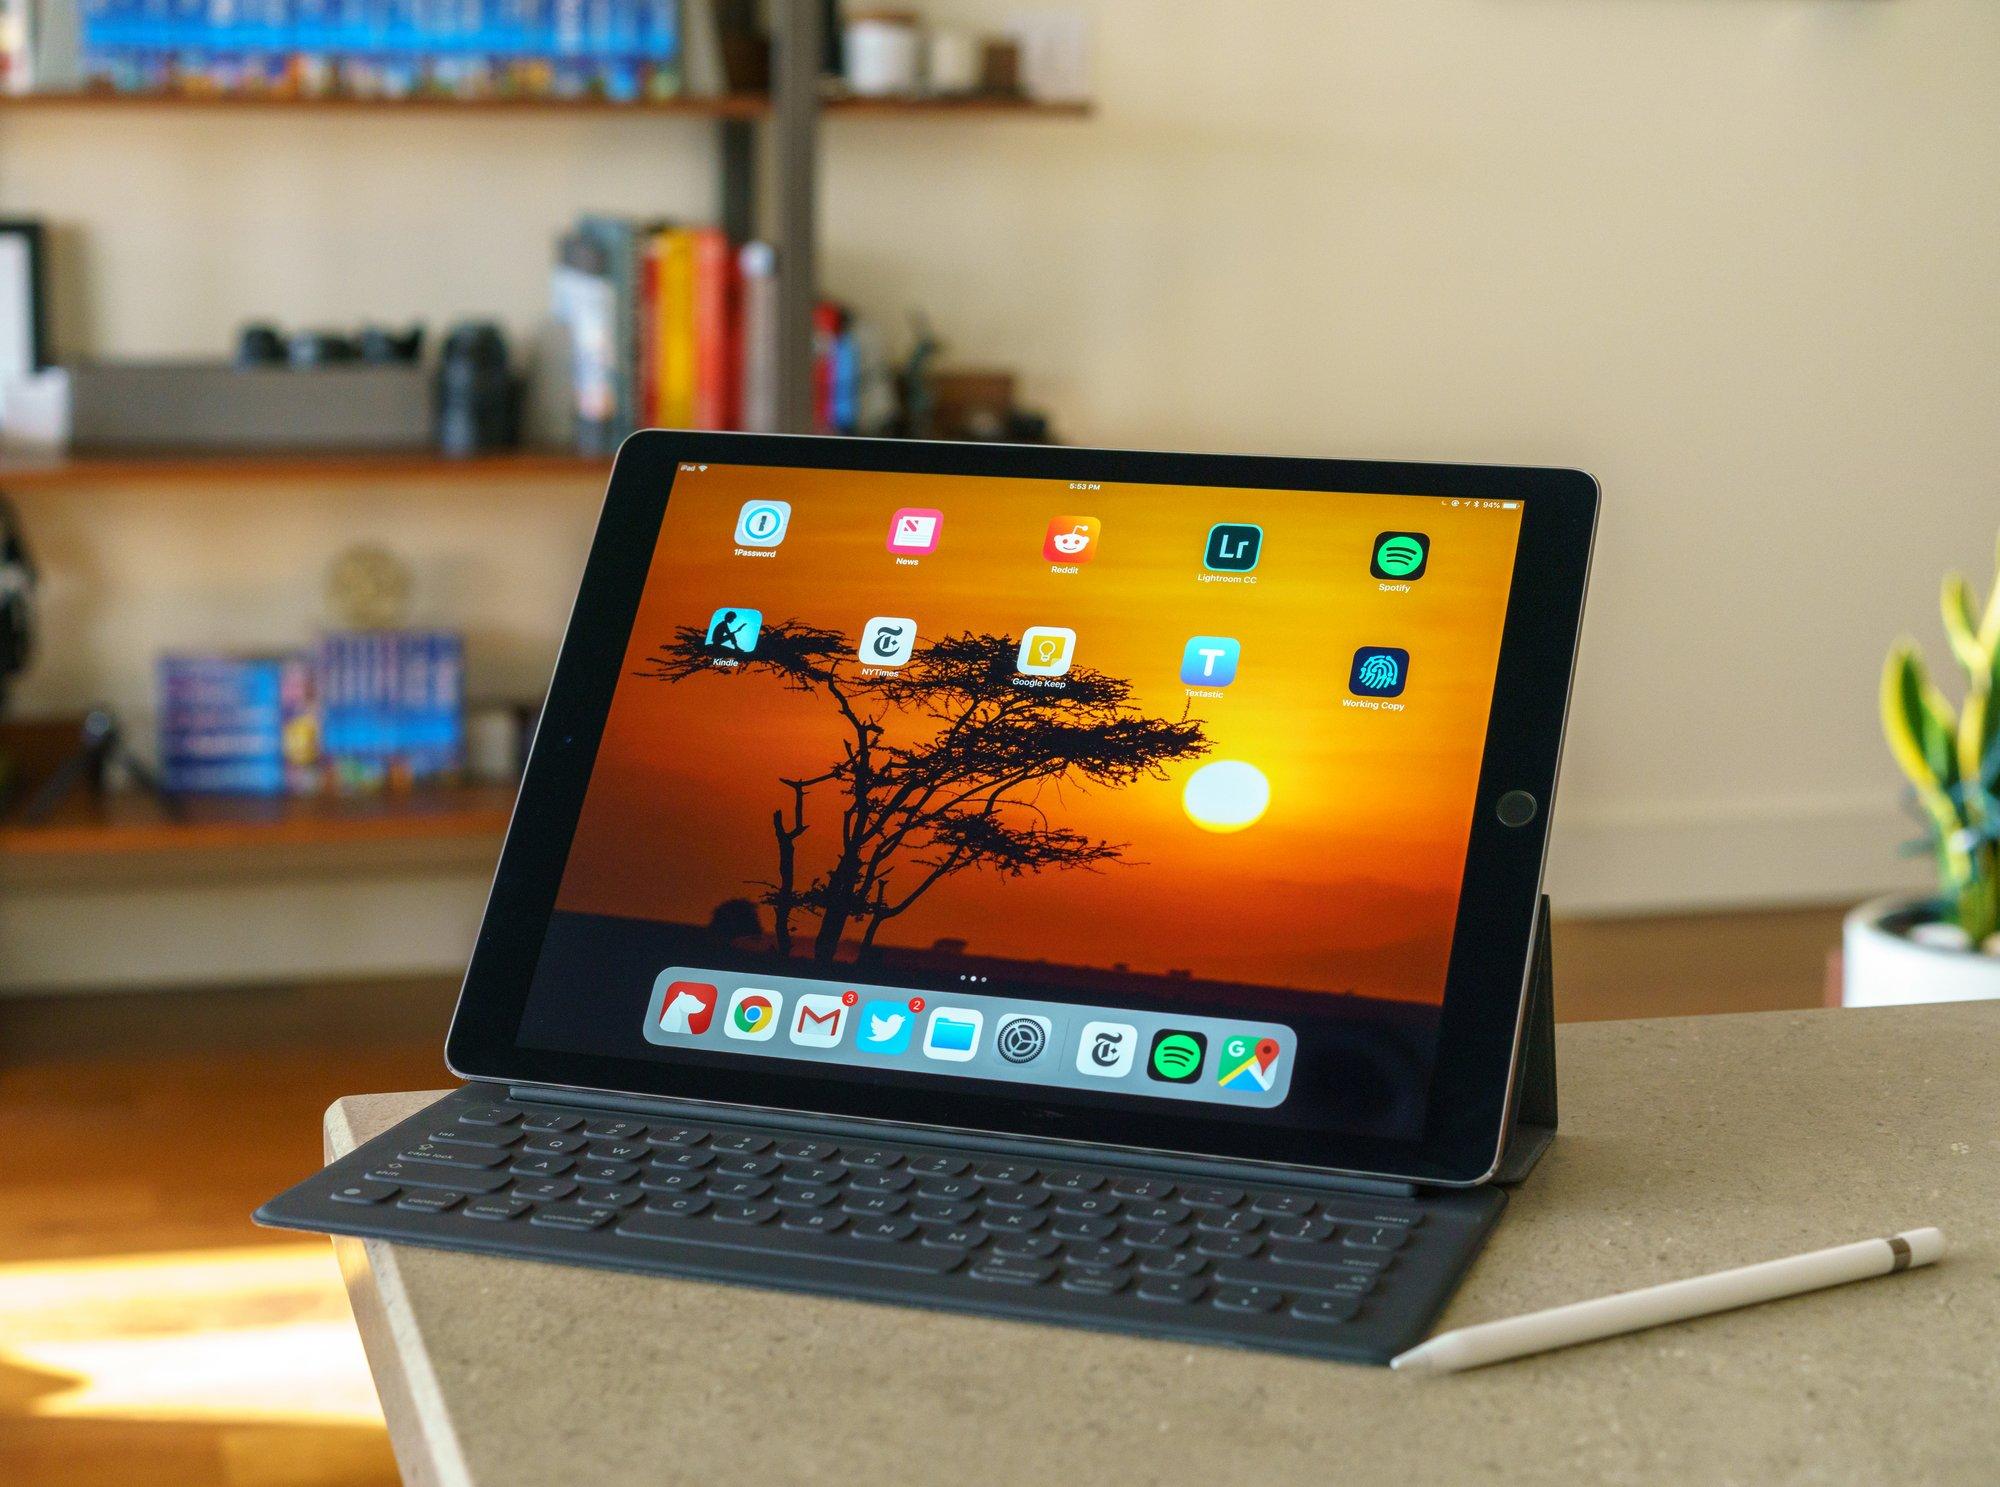 Laptop Or Ipad Pro Reddit - Best Image About Laptop